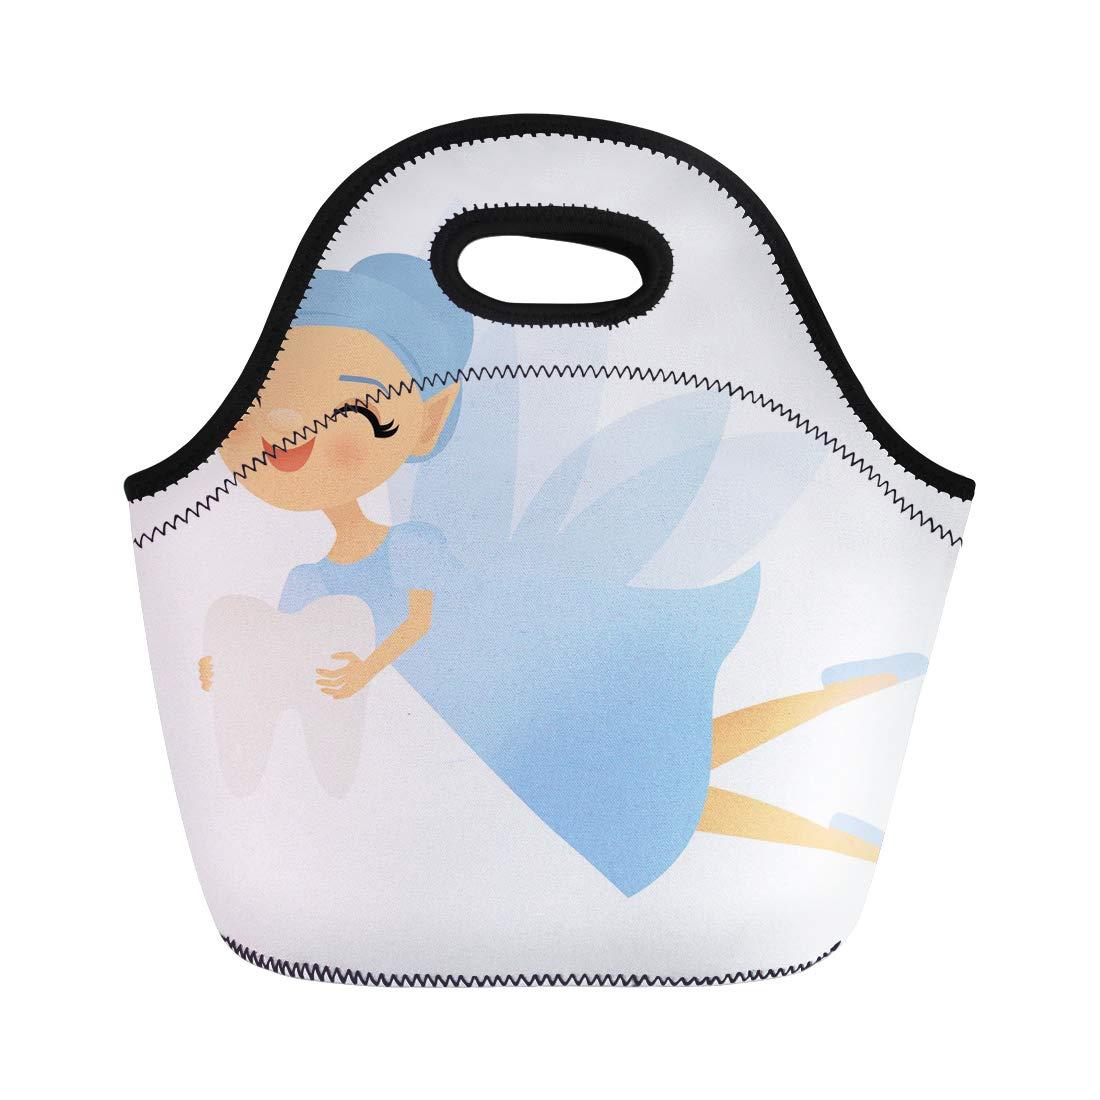 Amazon.com: Semtomn Lunch Tote Bag Cartoon Smiling Tooth.